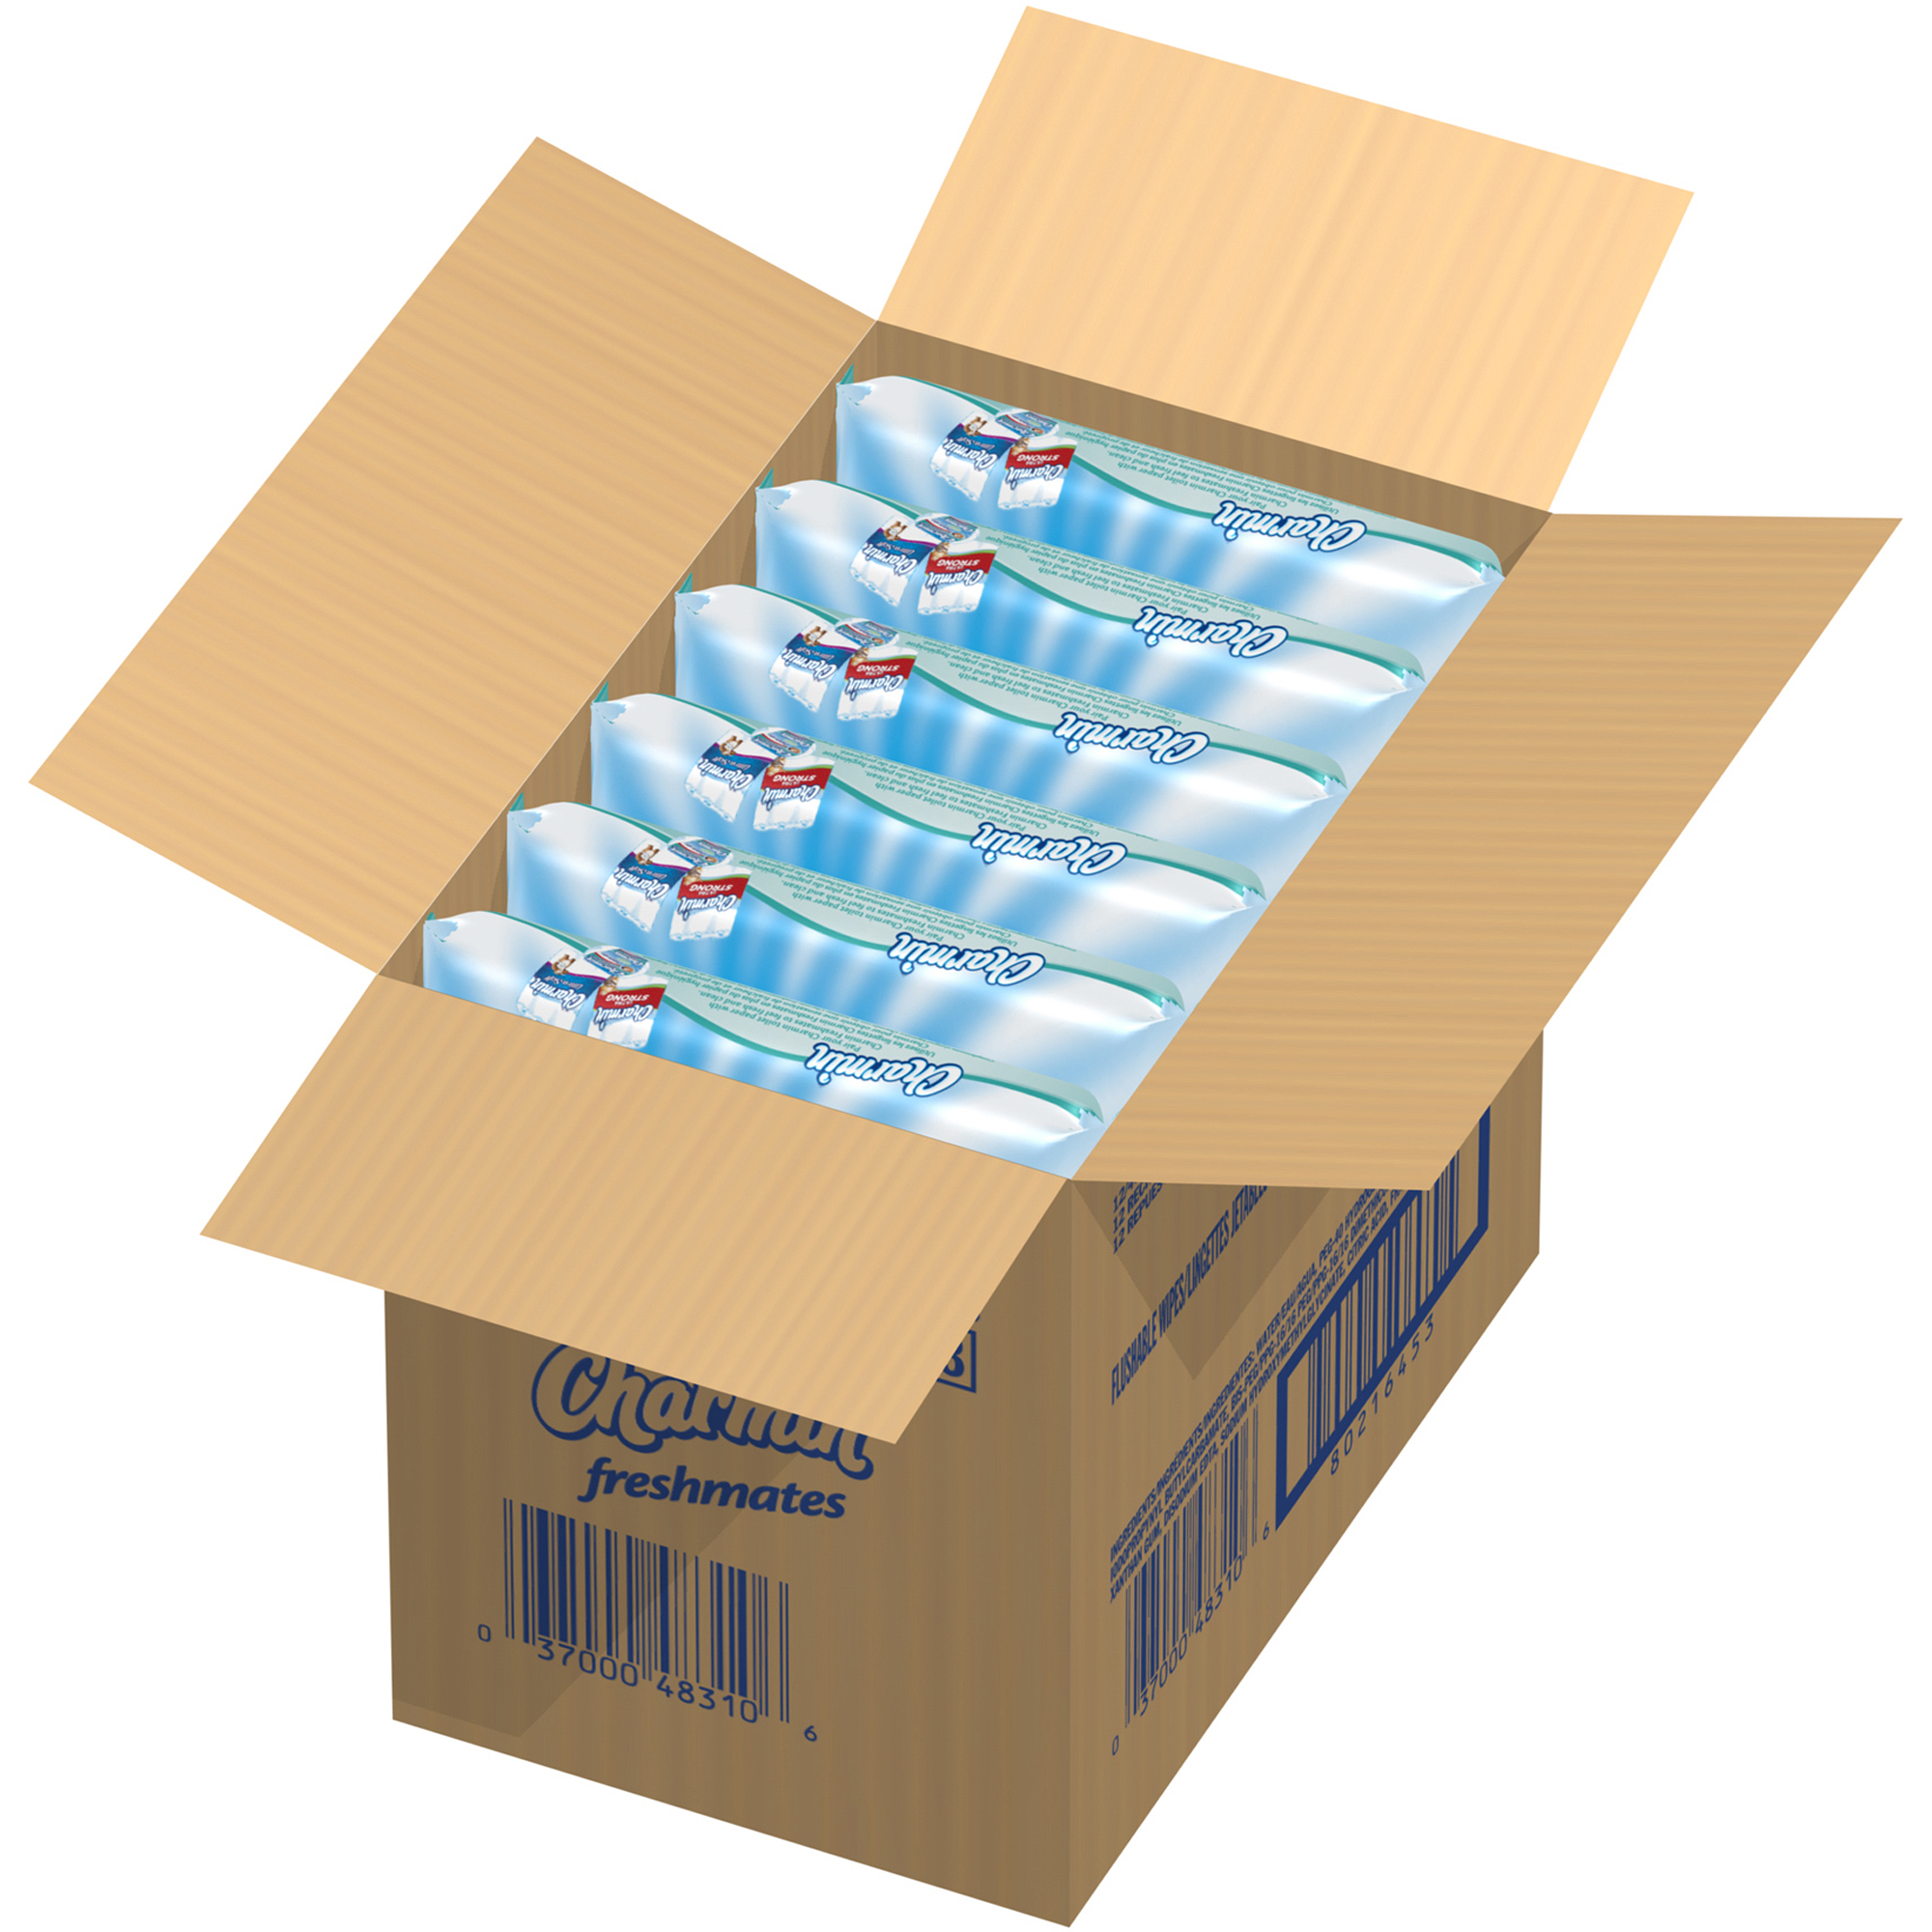 Charmin Freshmates Flushable Wet Wipes Refills, 480 sheets